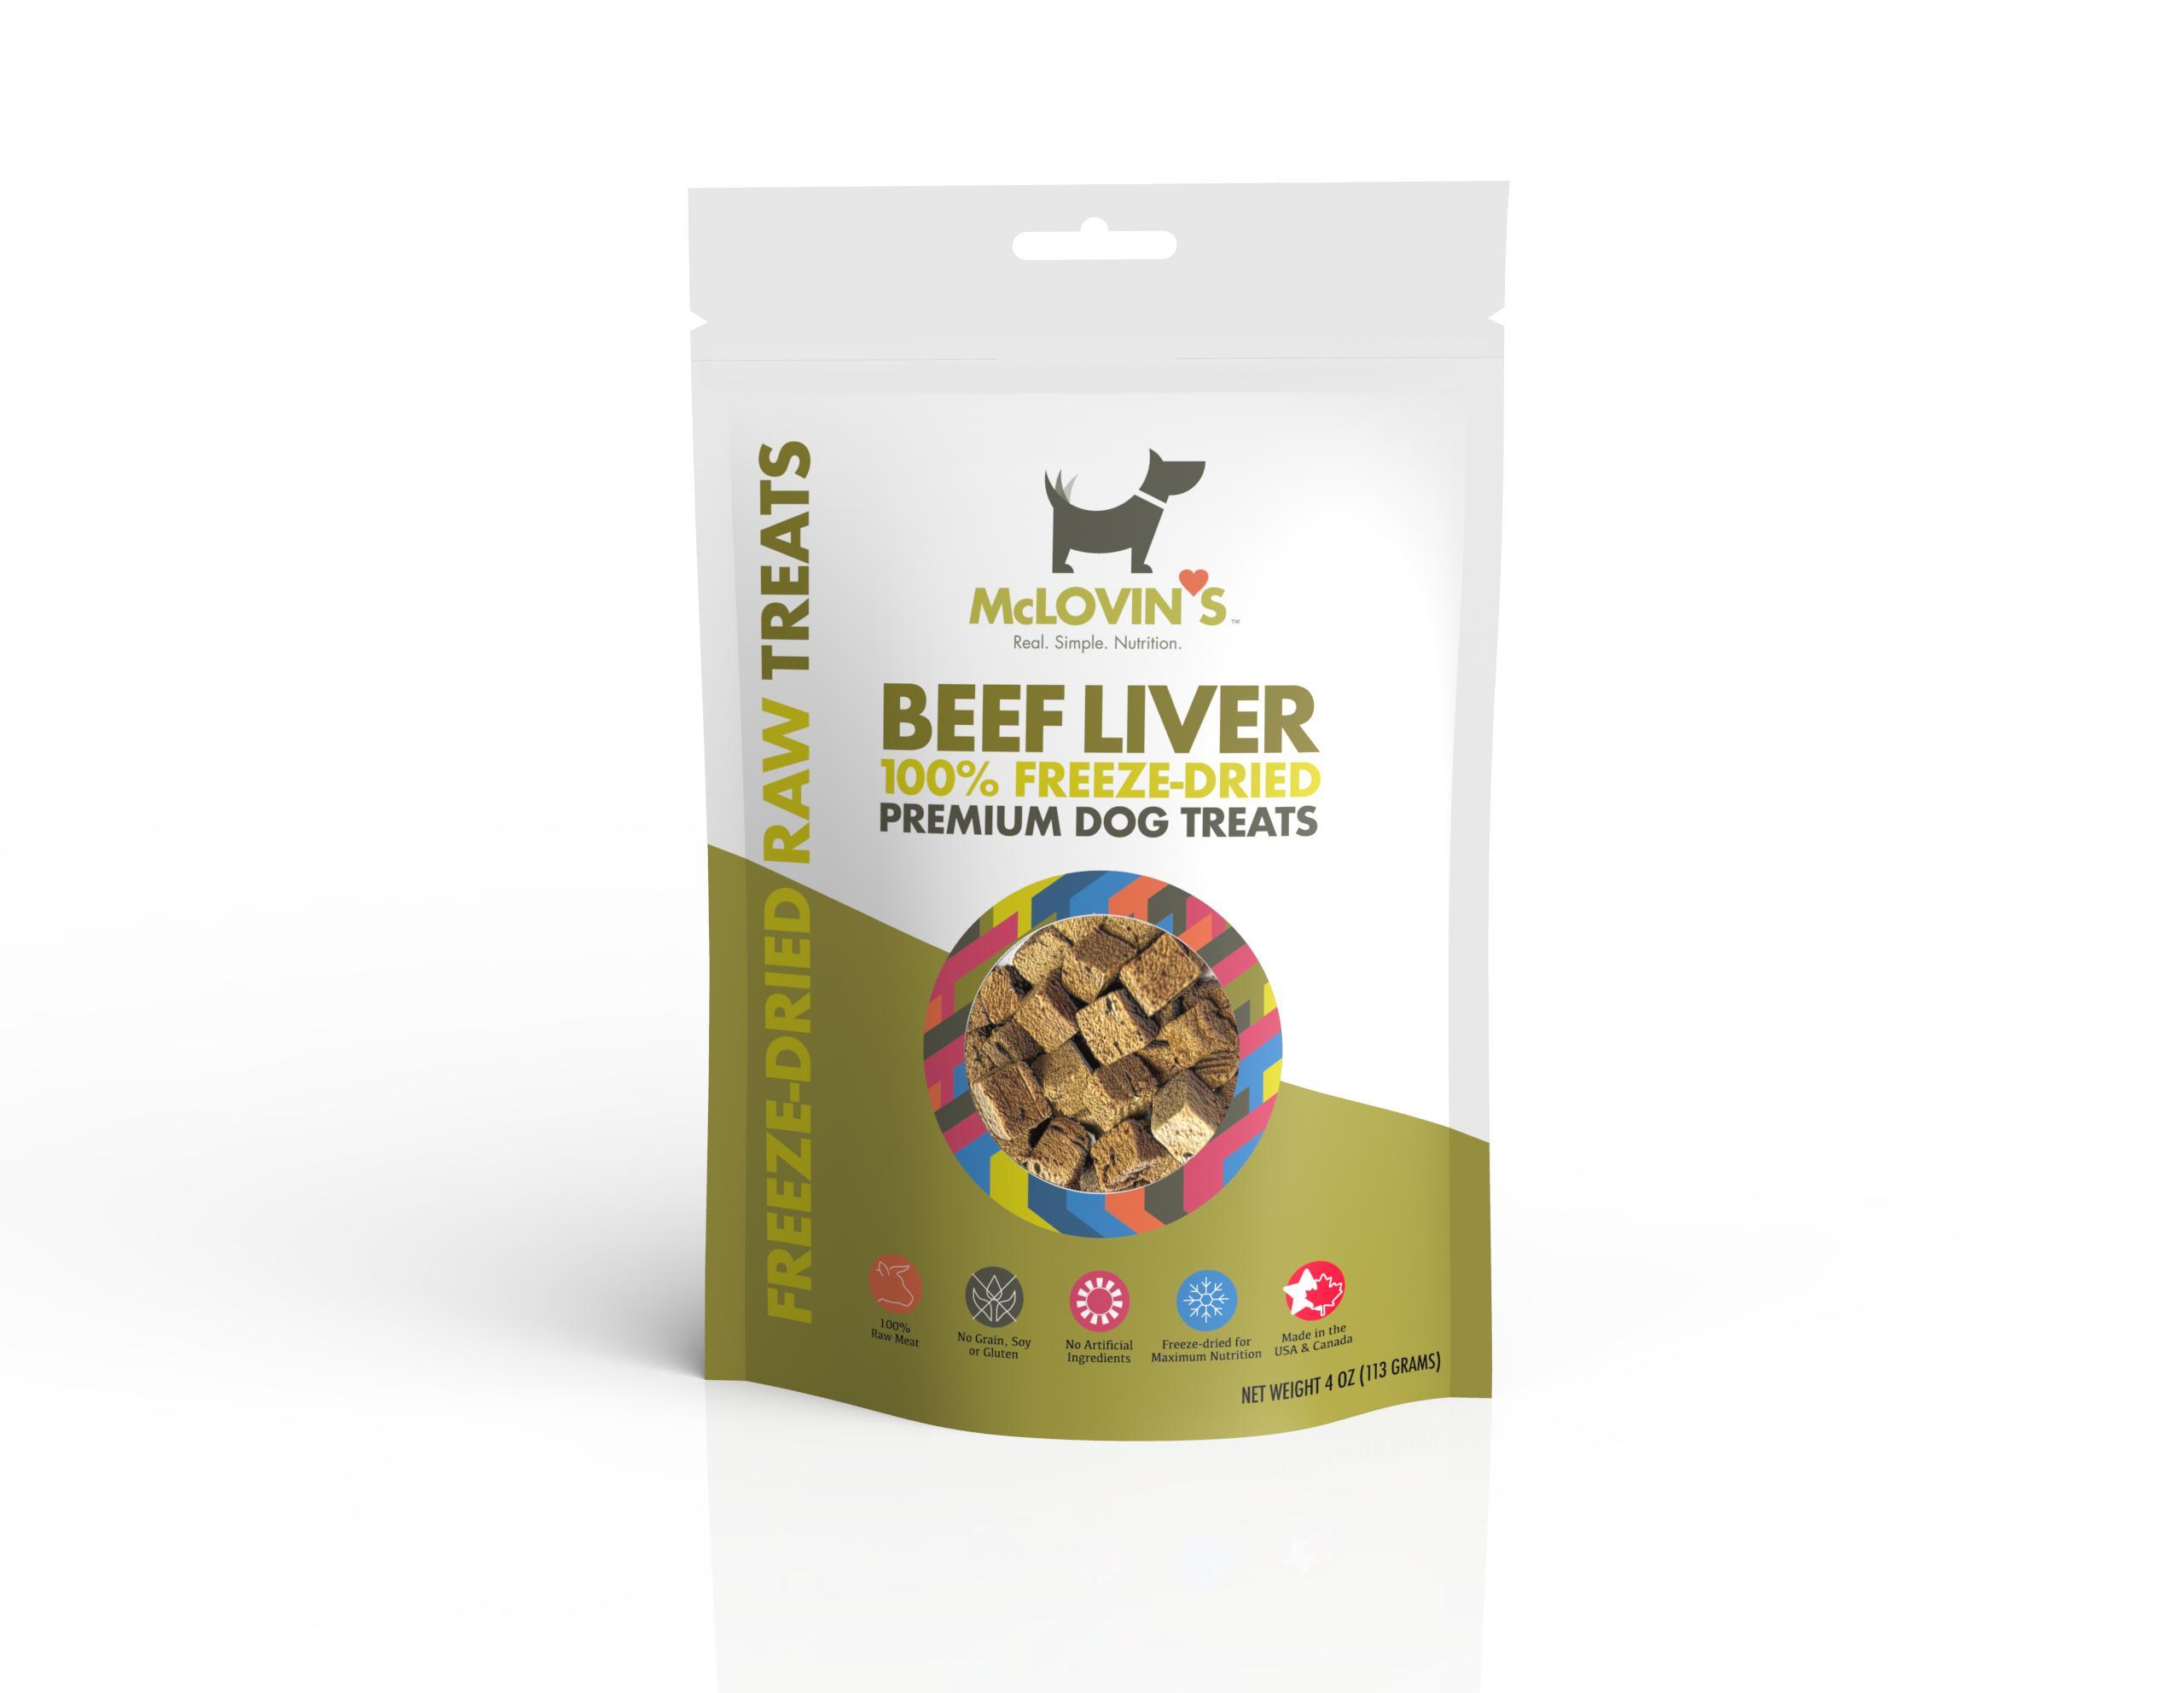 McLOVIN'S Beef Liver Freeze-Dried Dog Treats Image